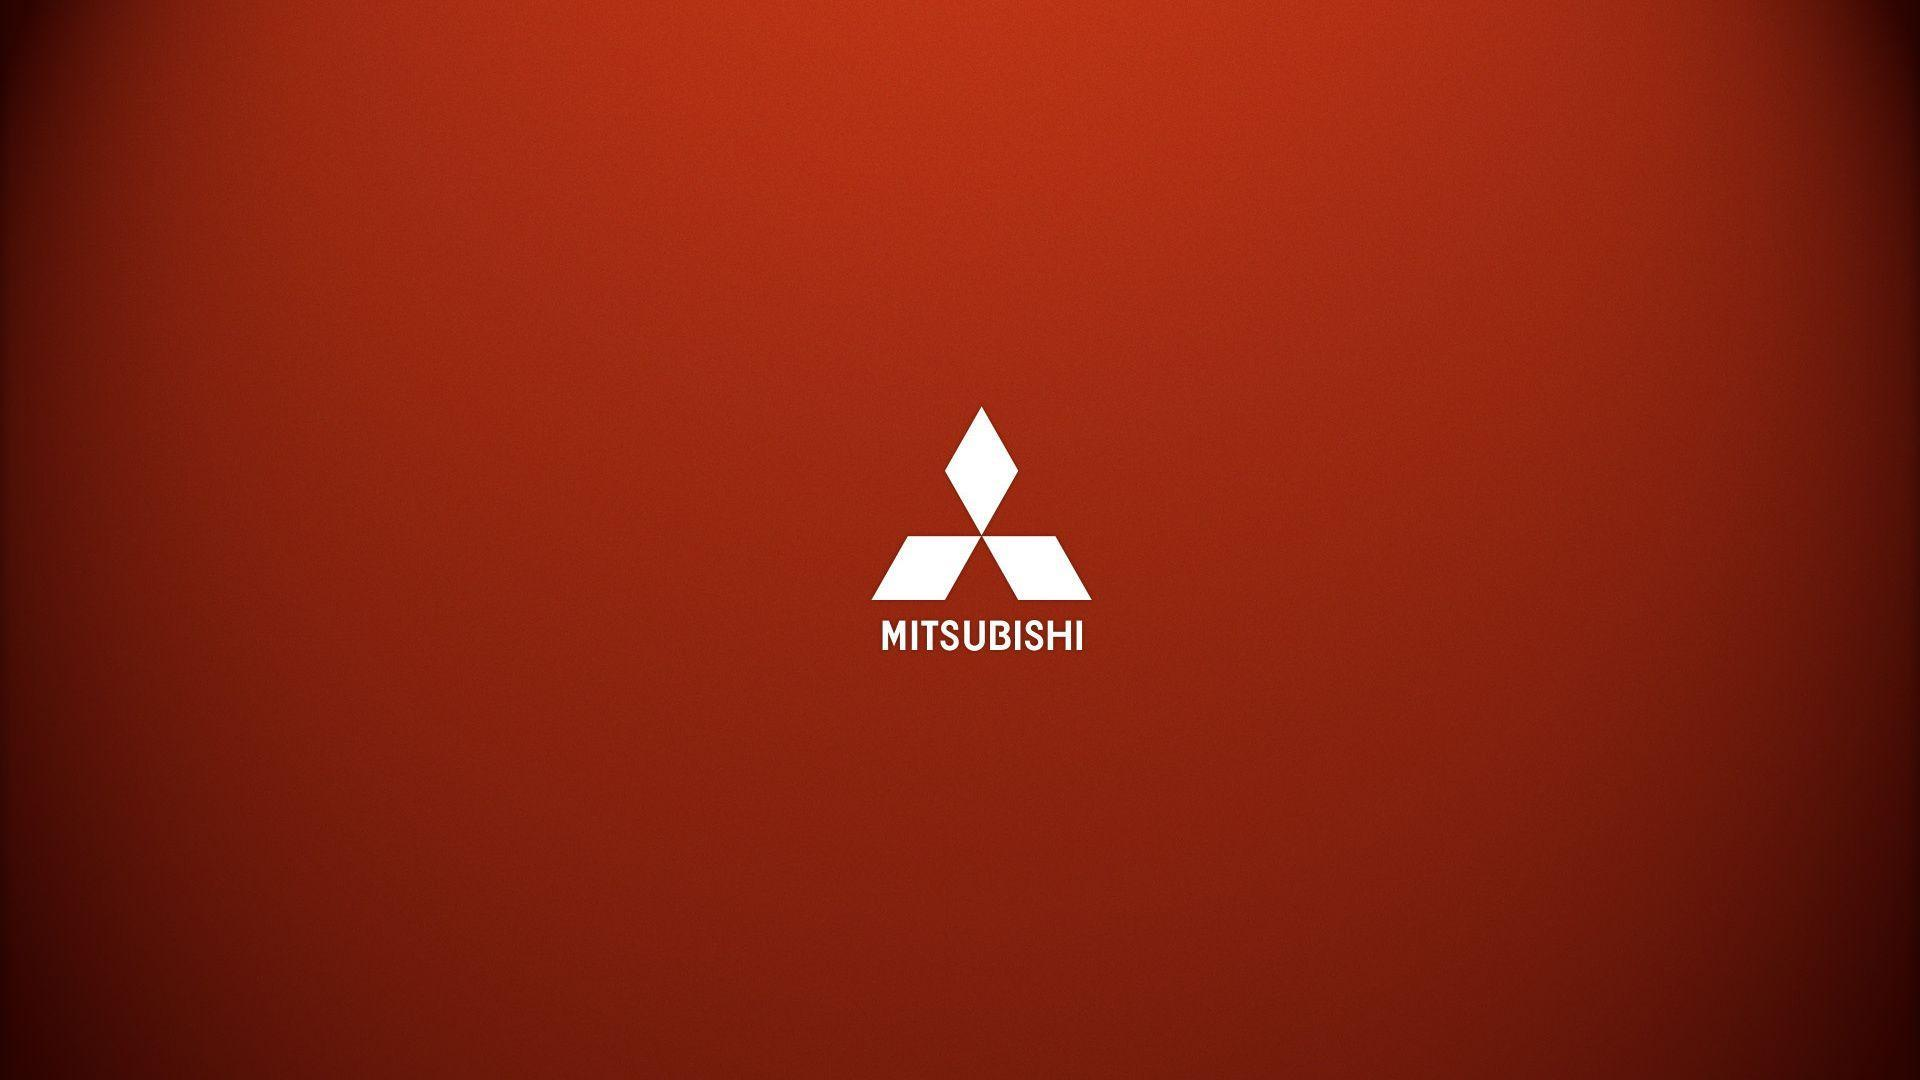 Mitsubishi Logo Wallpapers